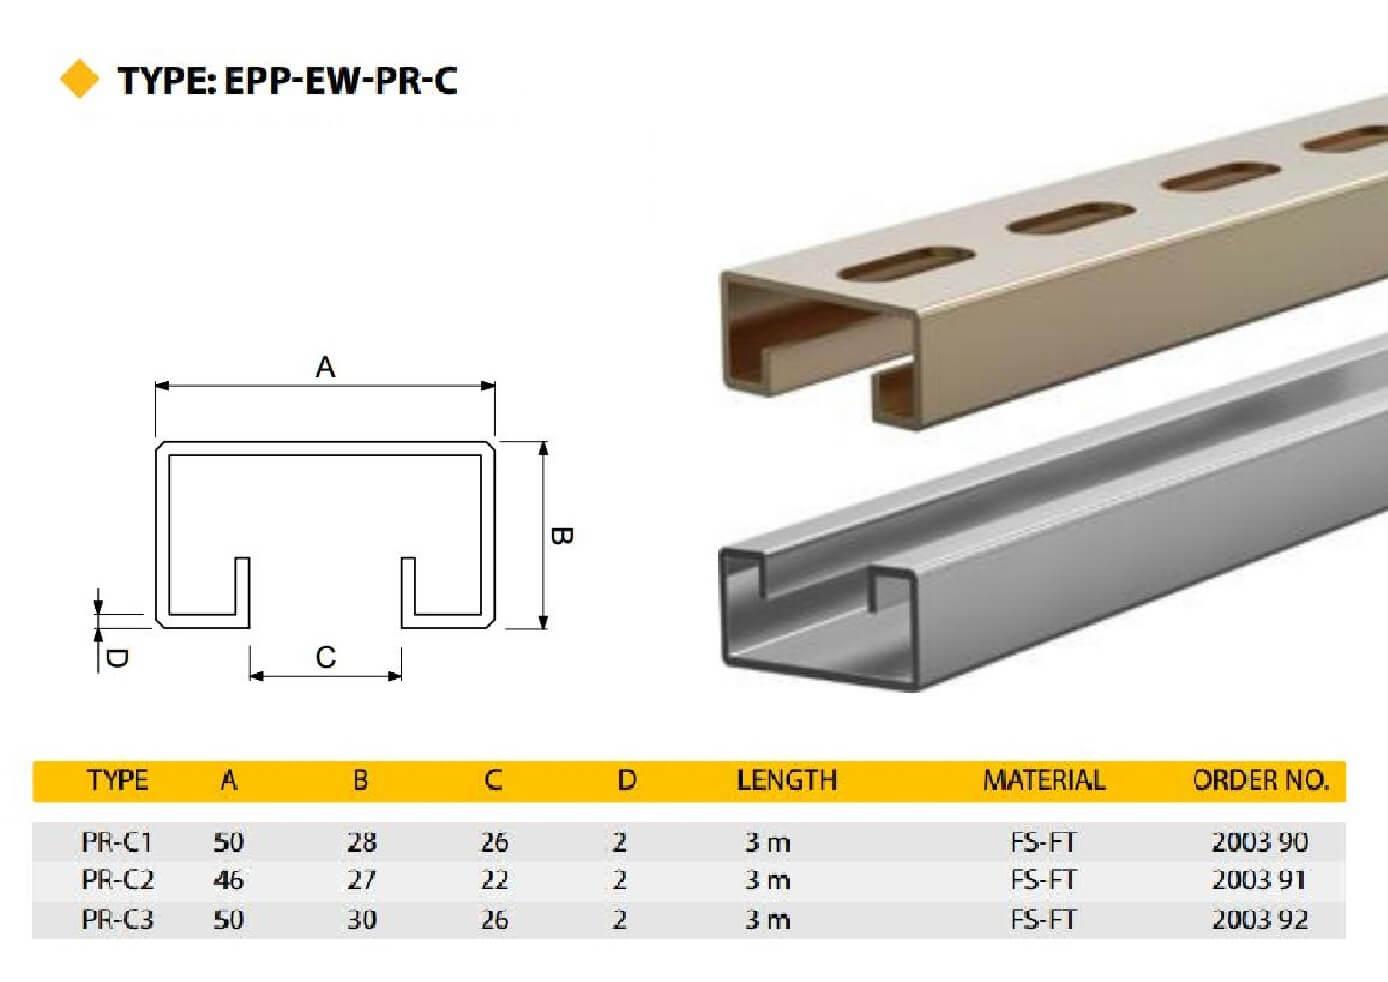 E.P.P - EWPRC Technical Datasheet